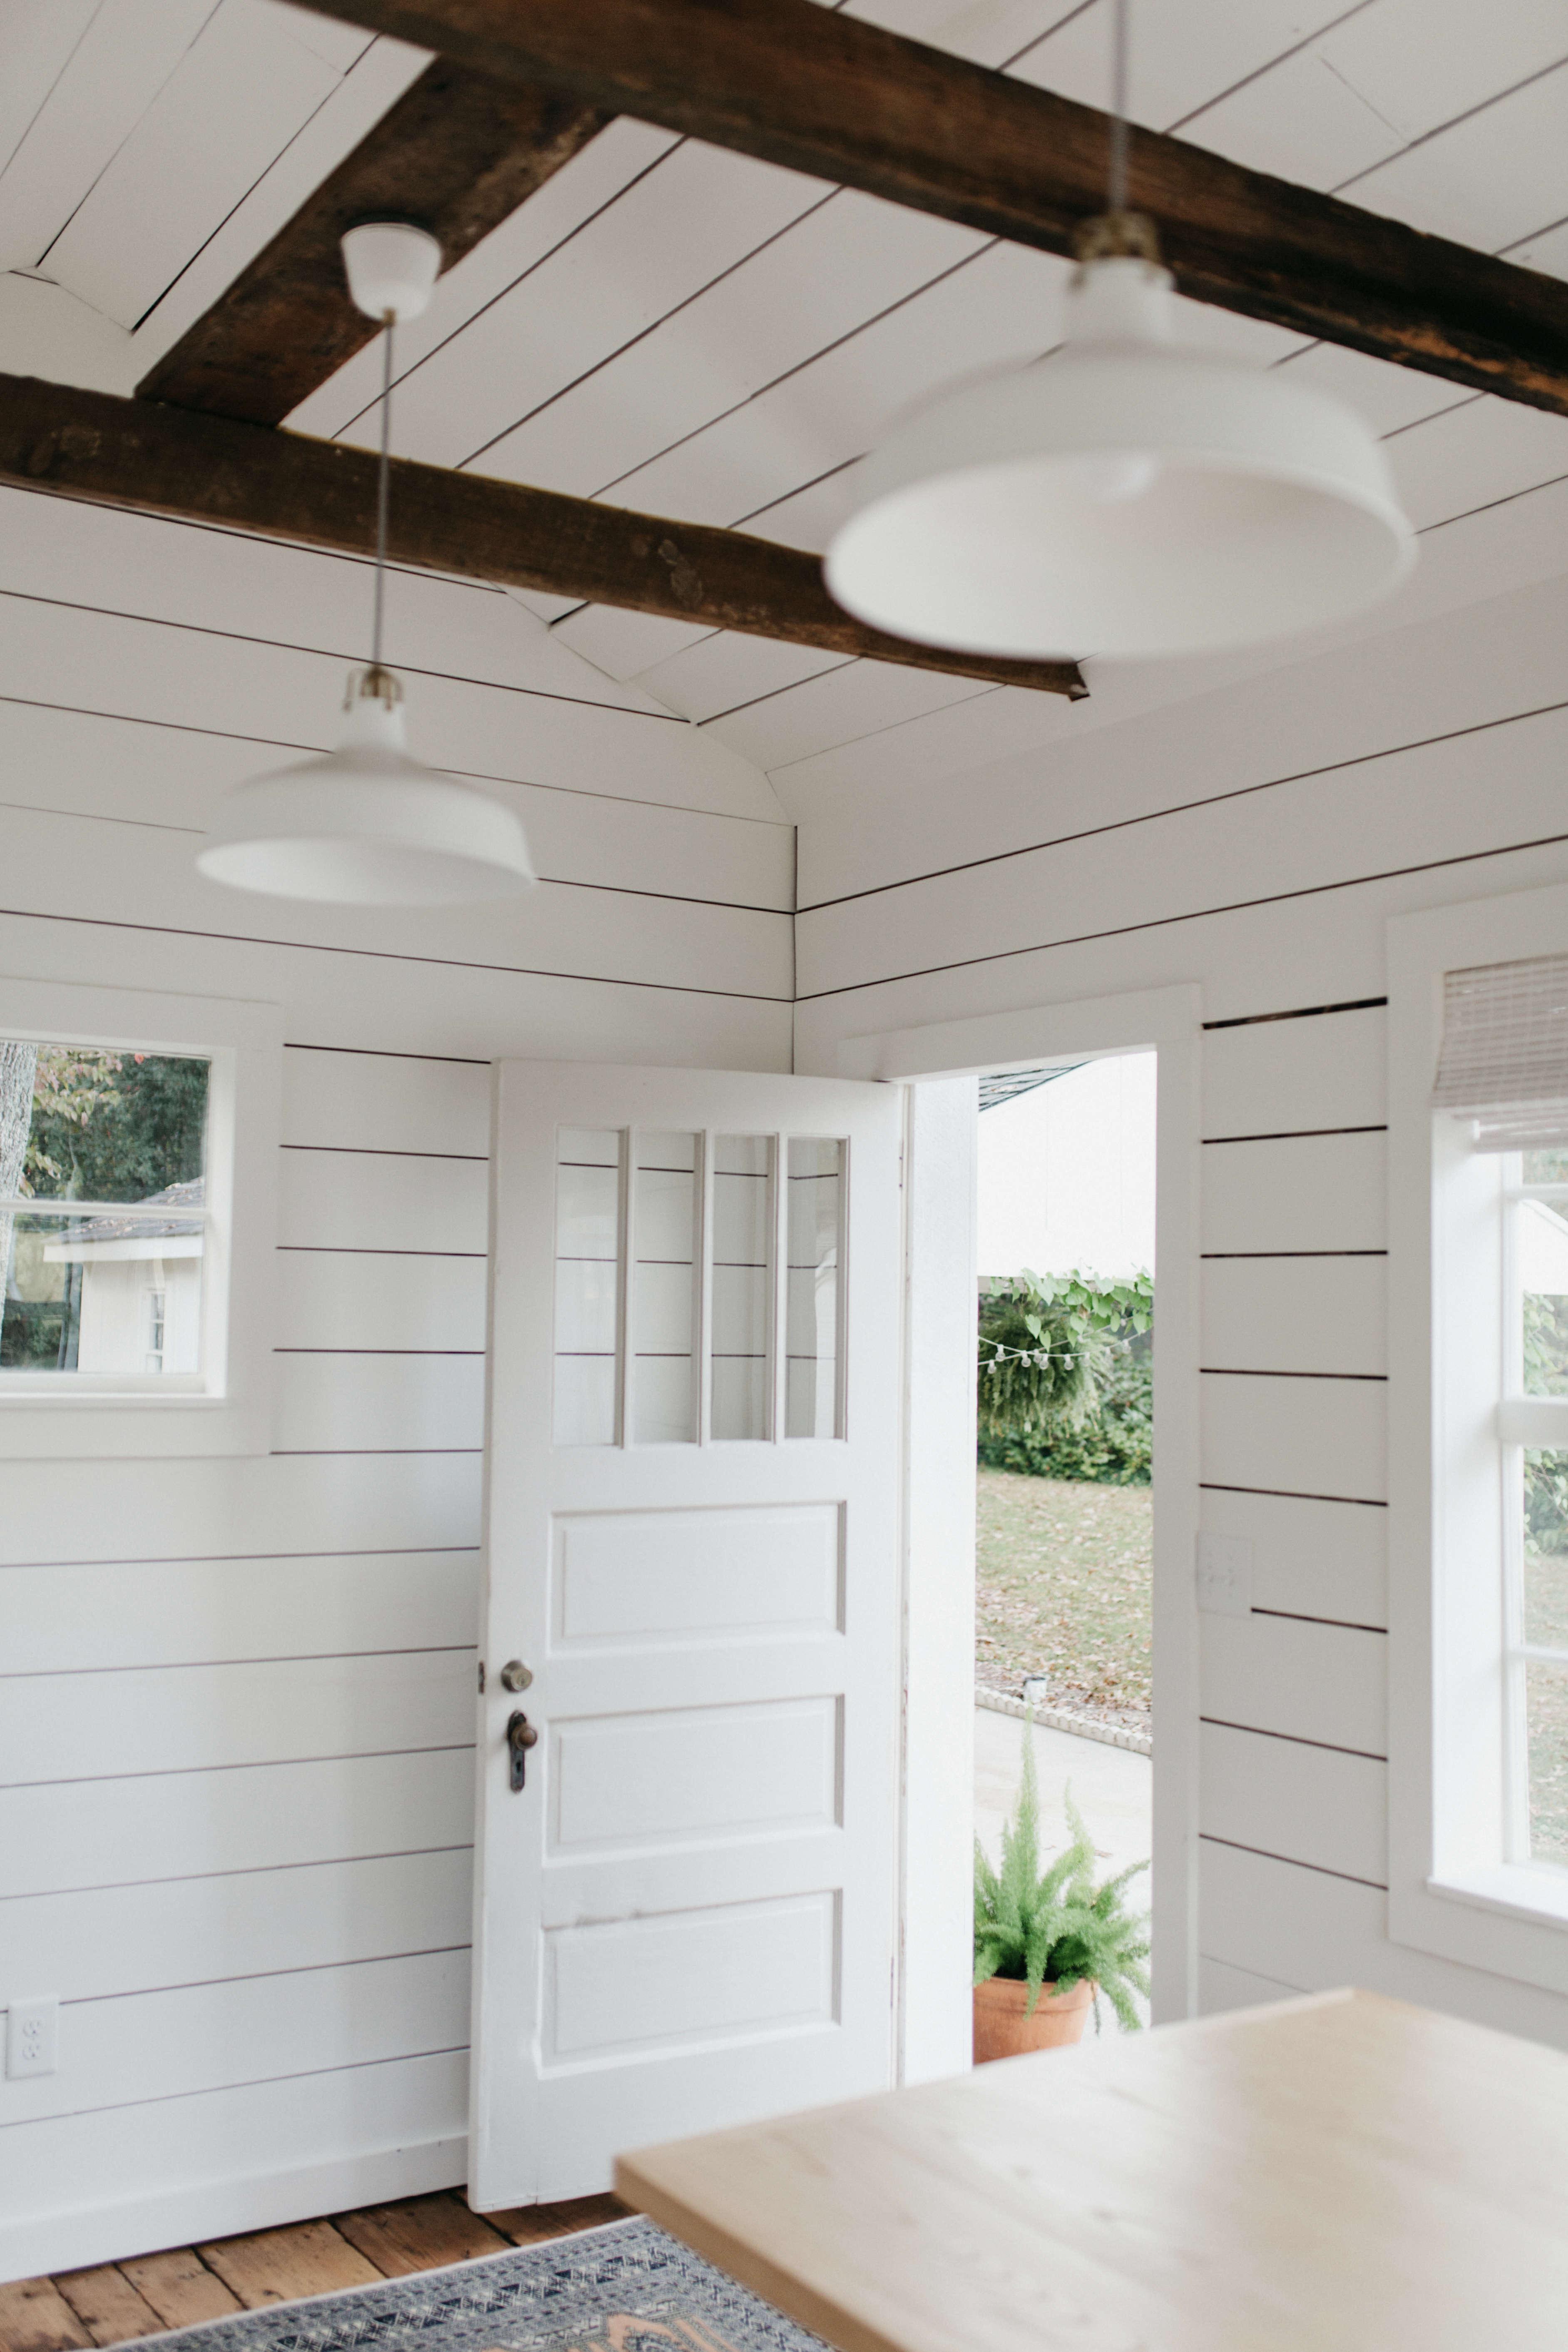 Good South Studio Final Interior Towards Door, Photo by Brett and Jessica Photography